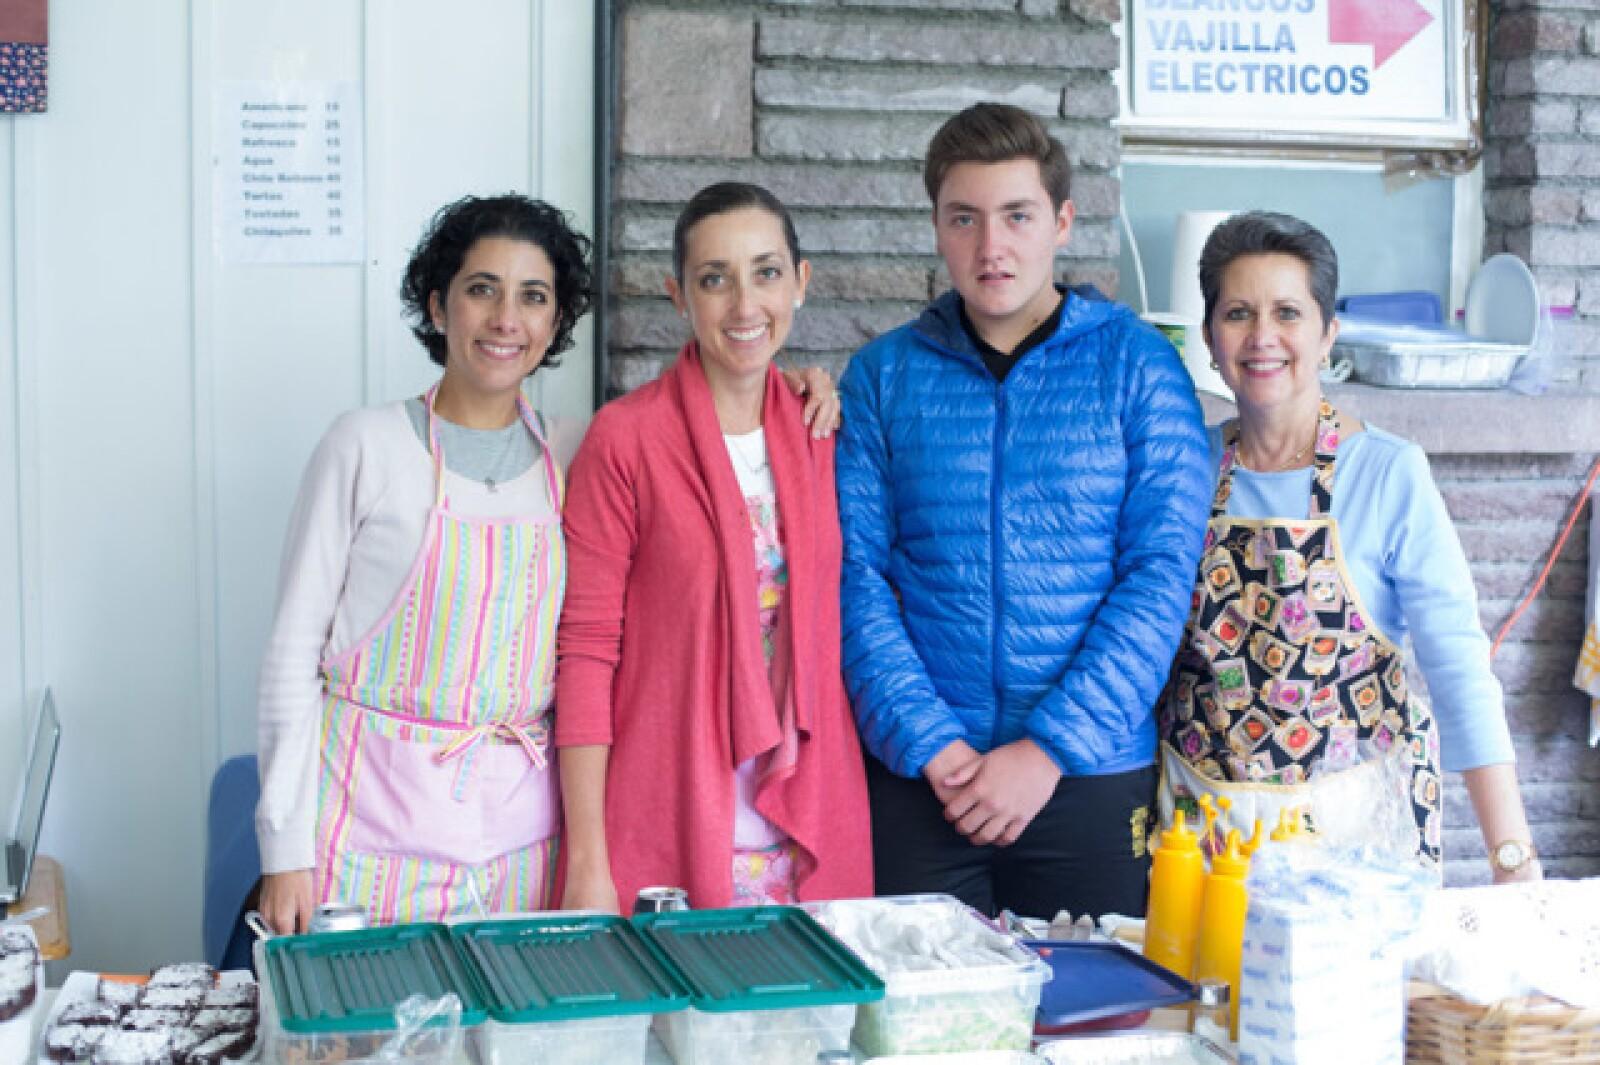 Susana Amezcua, Jimena y Alejandro Vera y Susana Amezcua